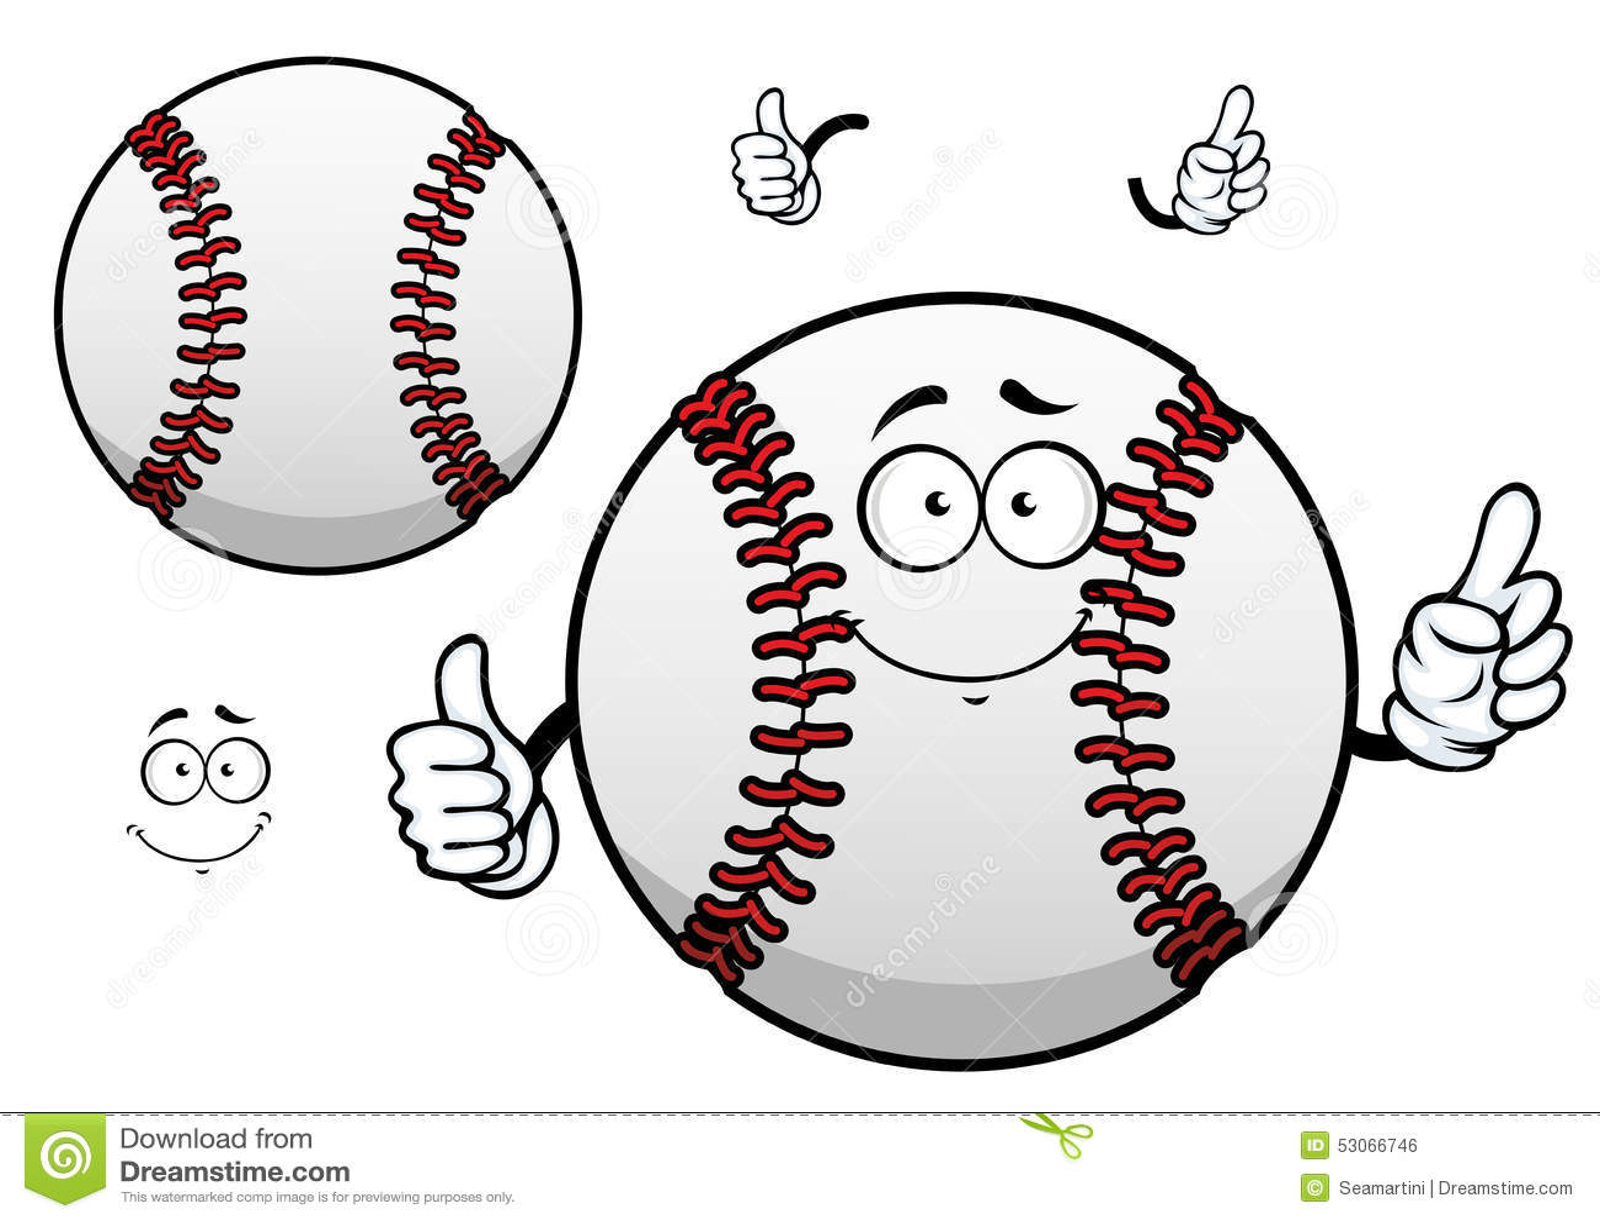 Cartoon Baseball Ball With Thumb Up Stock Vector